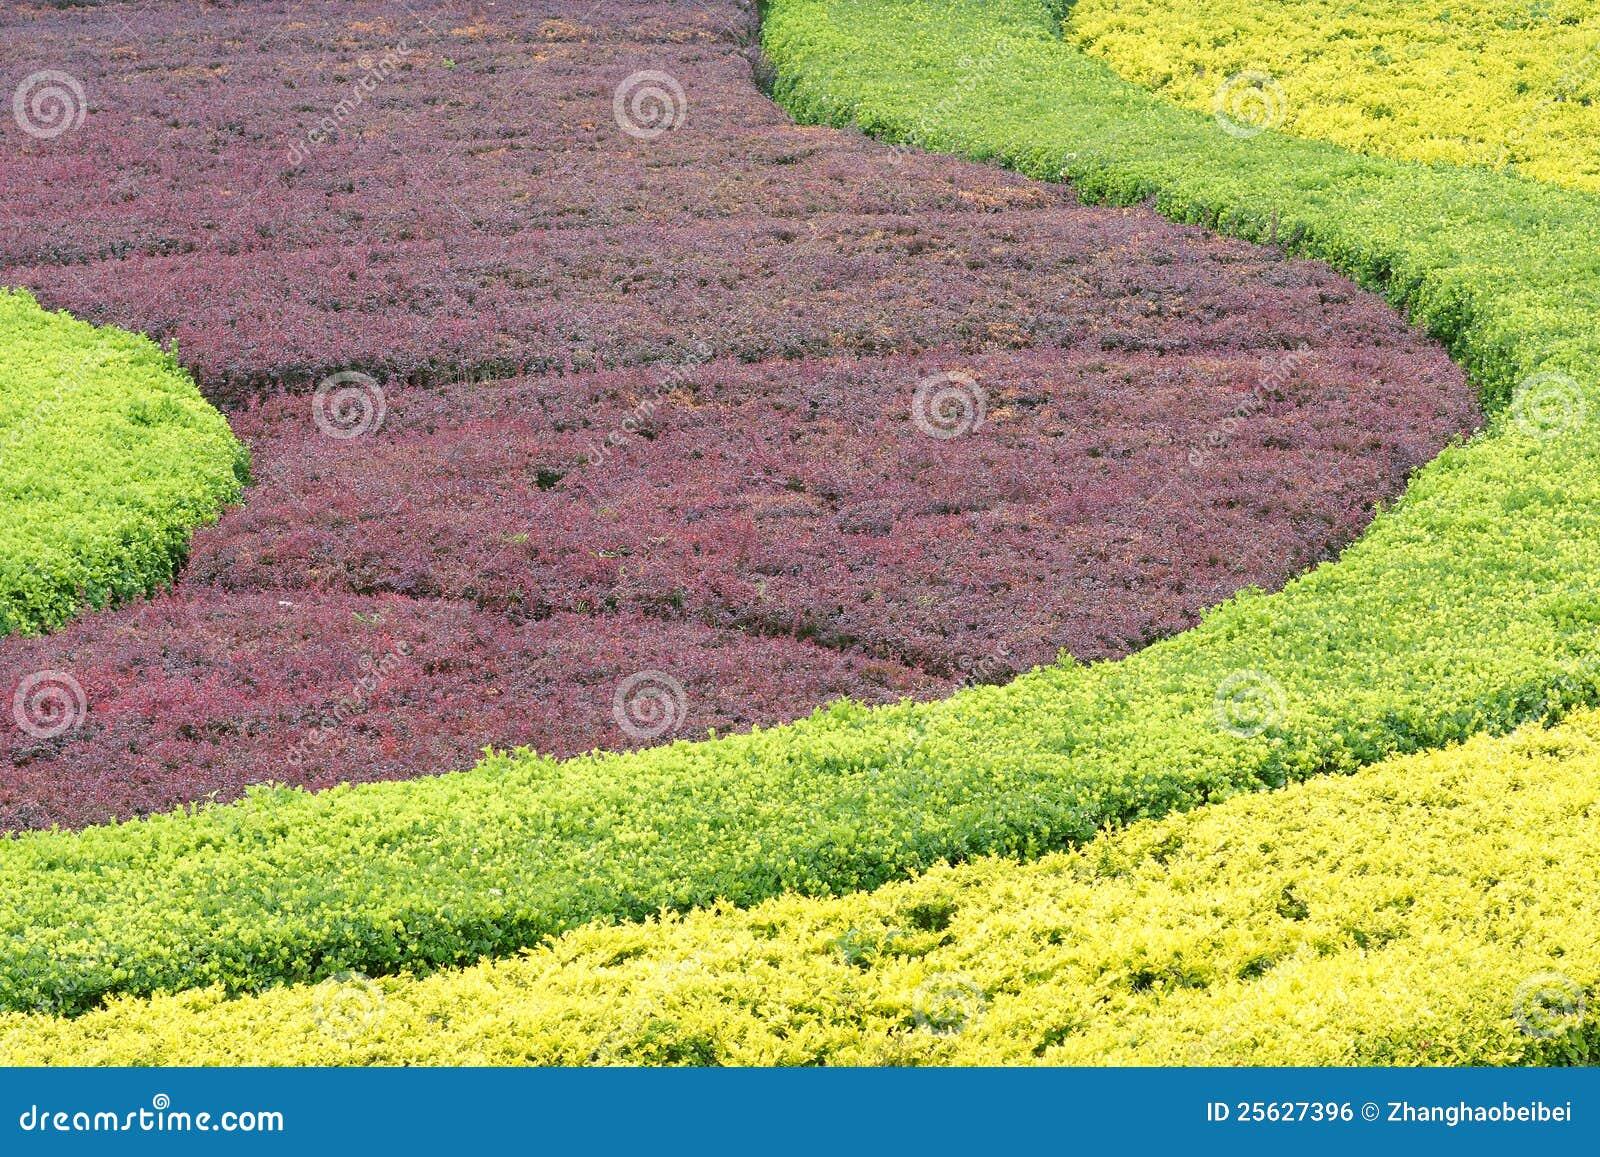 Colorized shrub